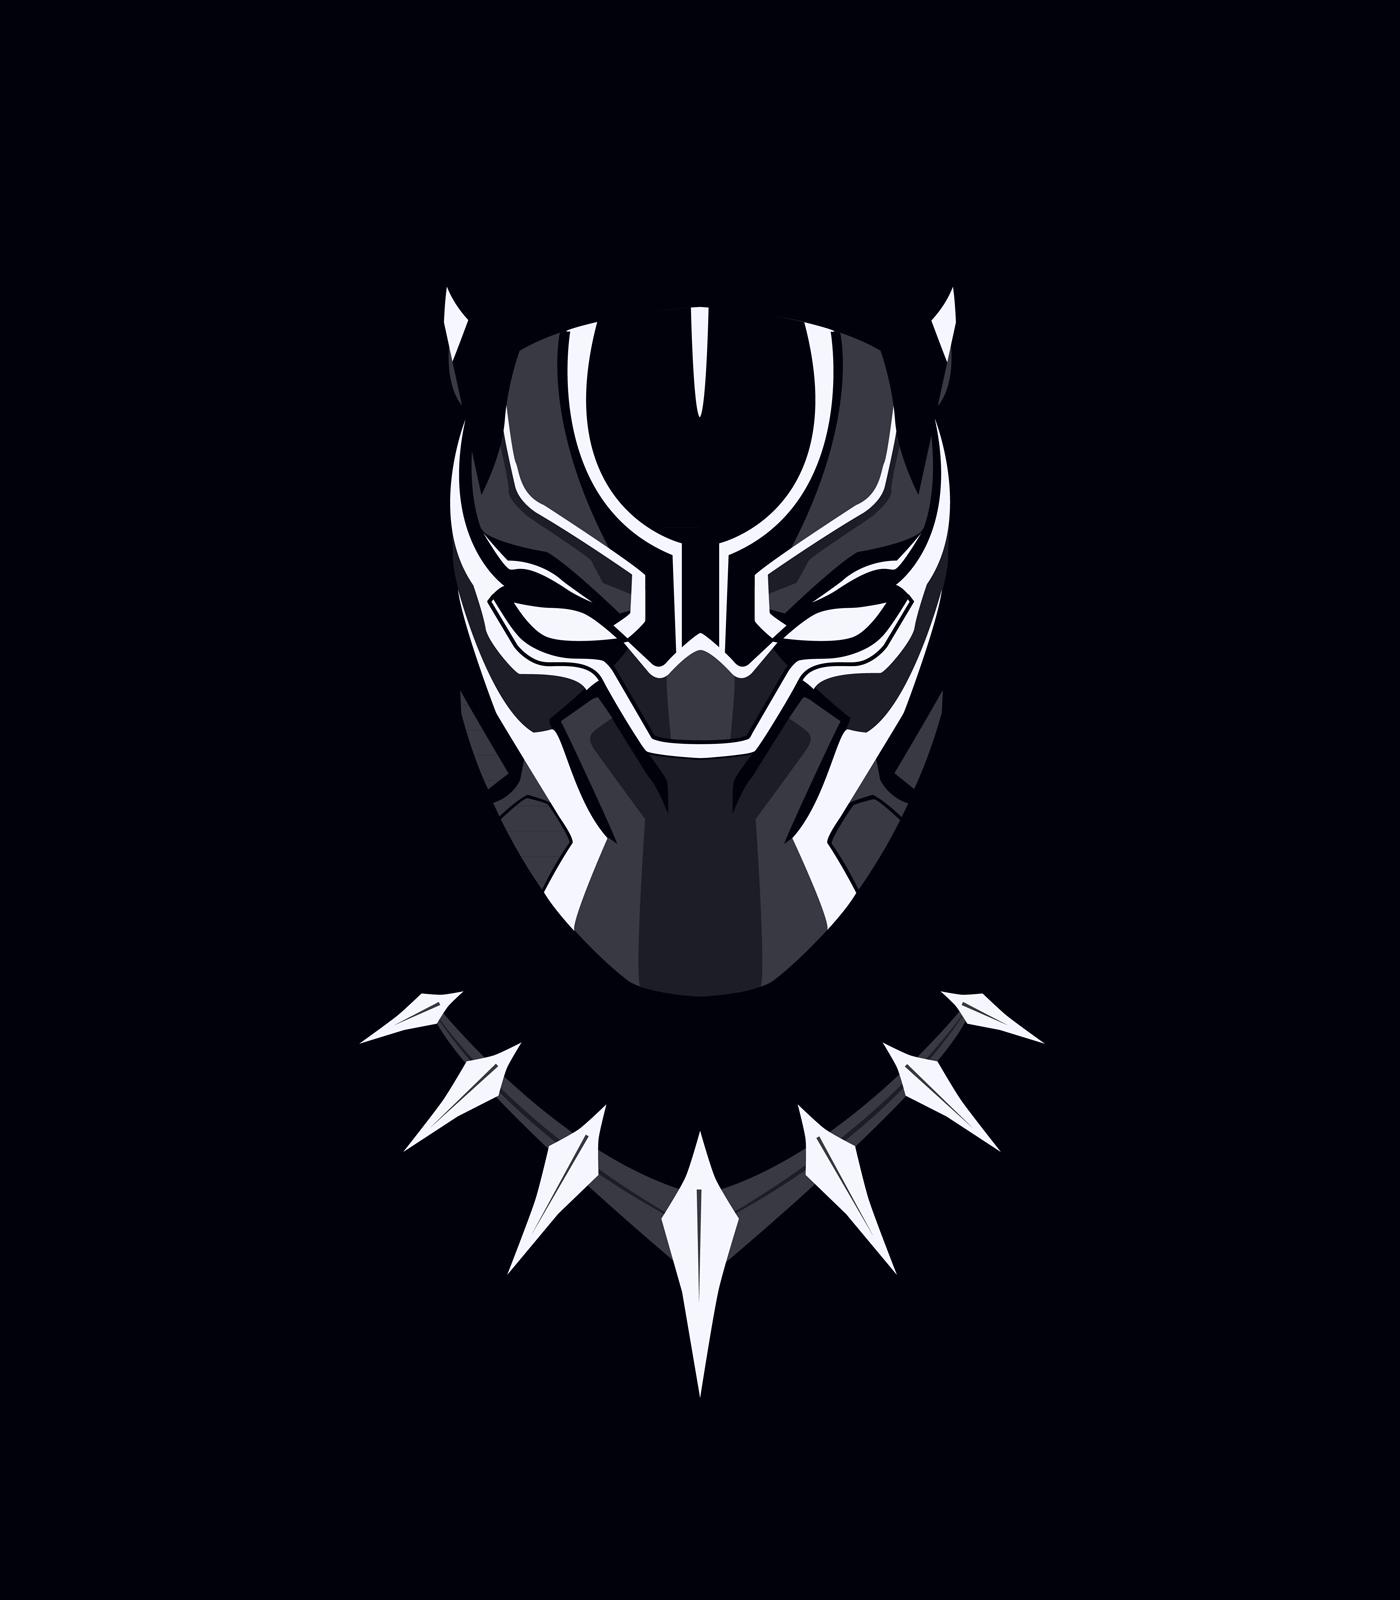 Marvel Black Panther Fondos De Pantalla 8392 Hd